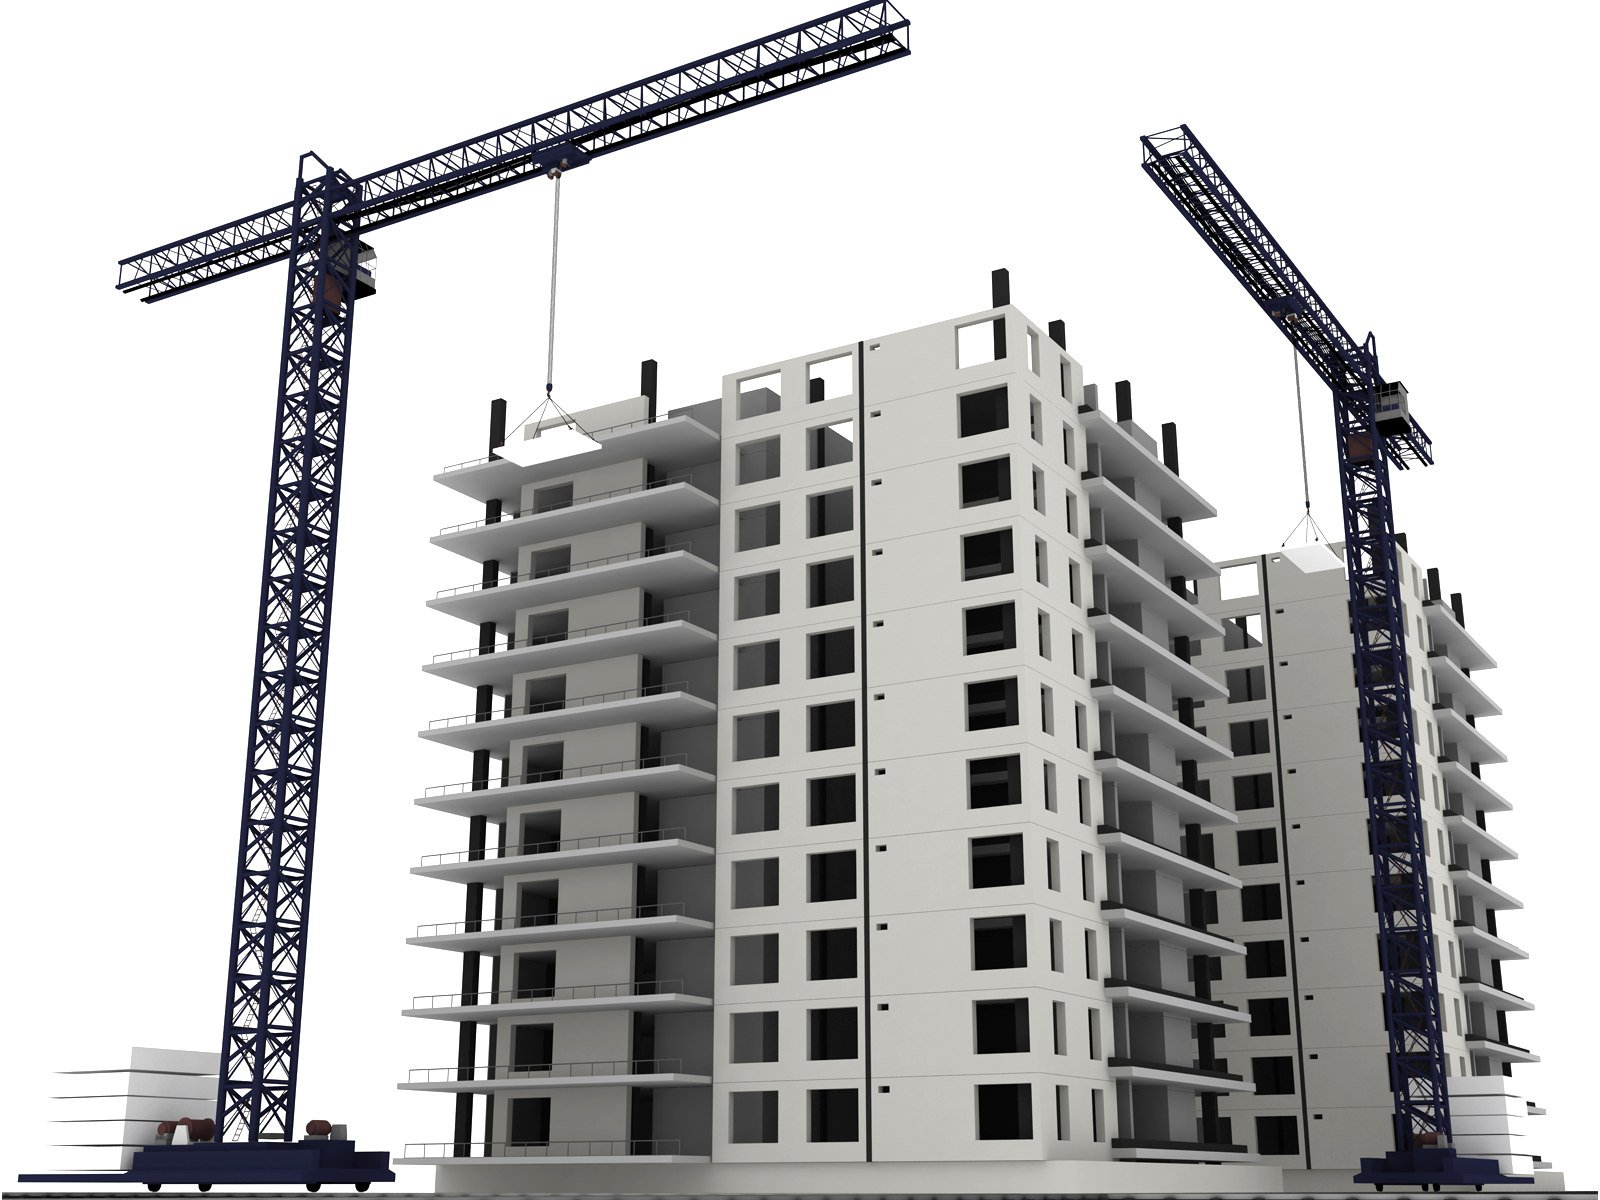 Building Construction Jobs : Construction work building job profession architecture